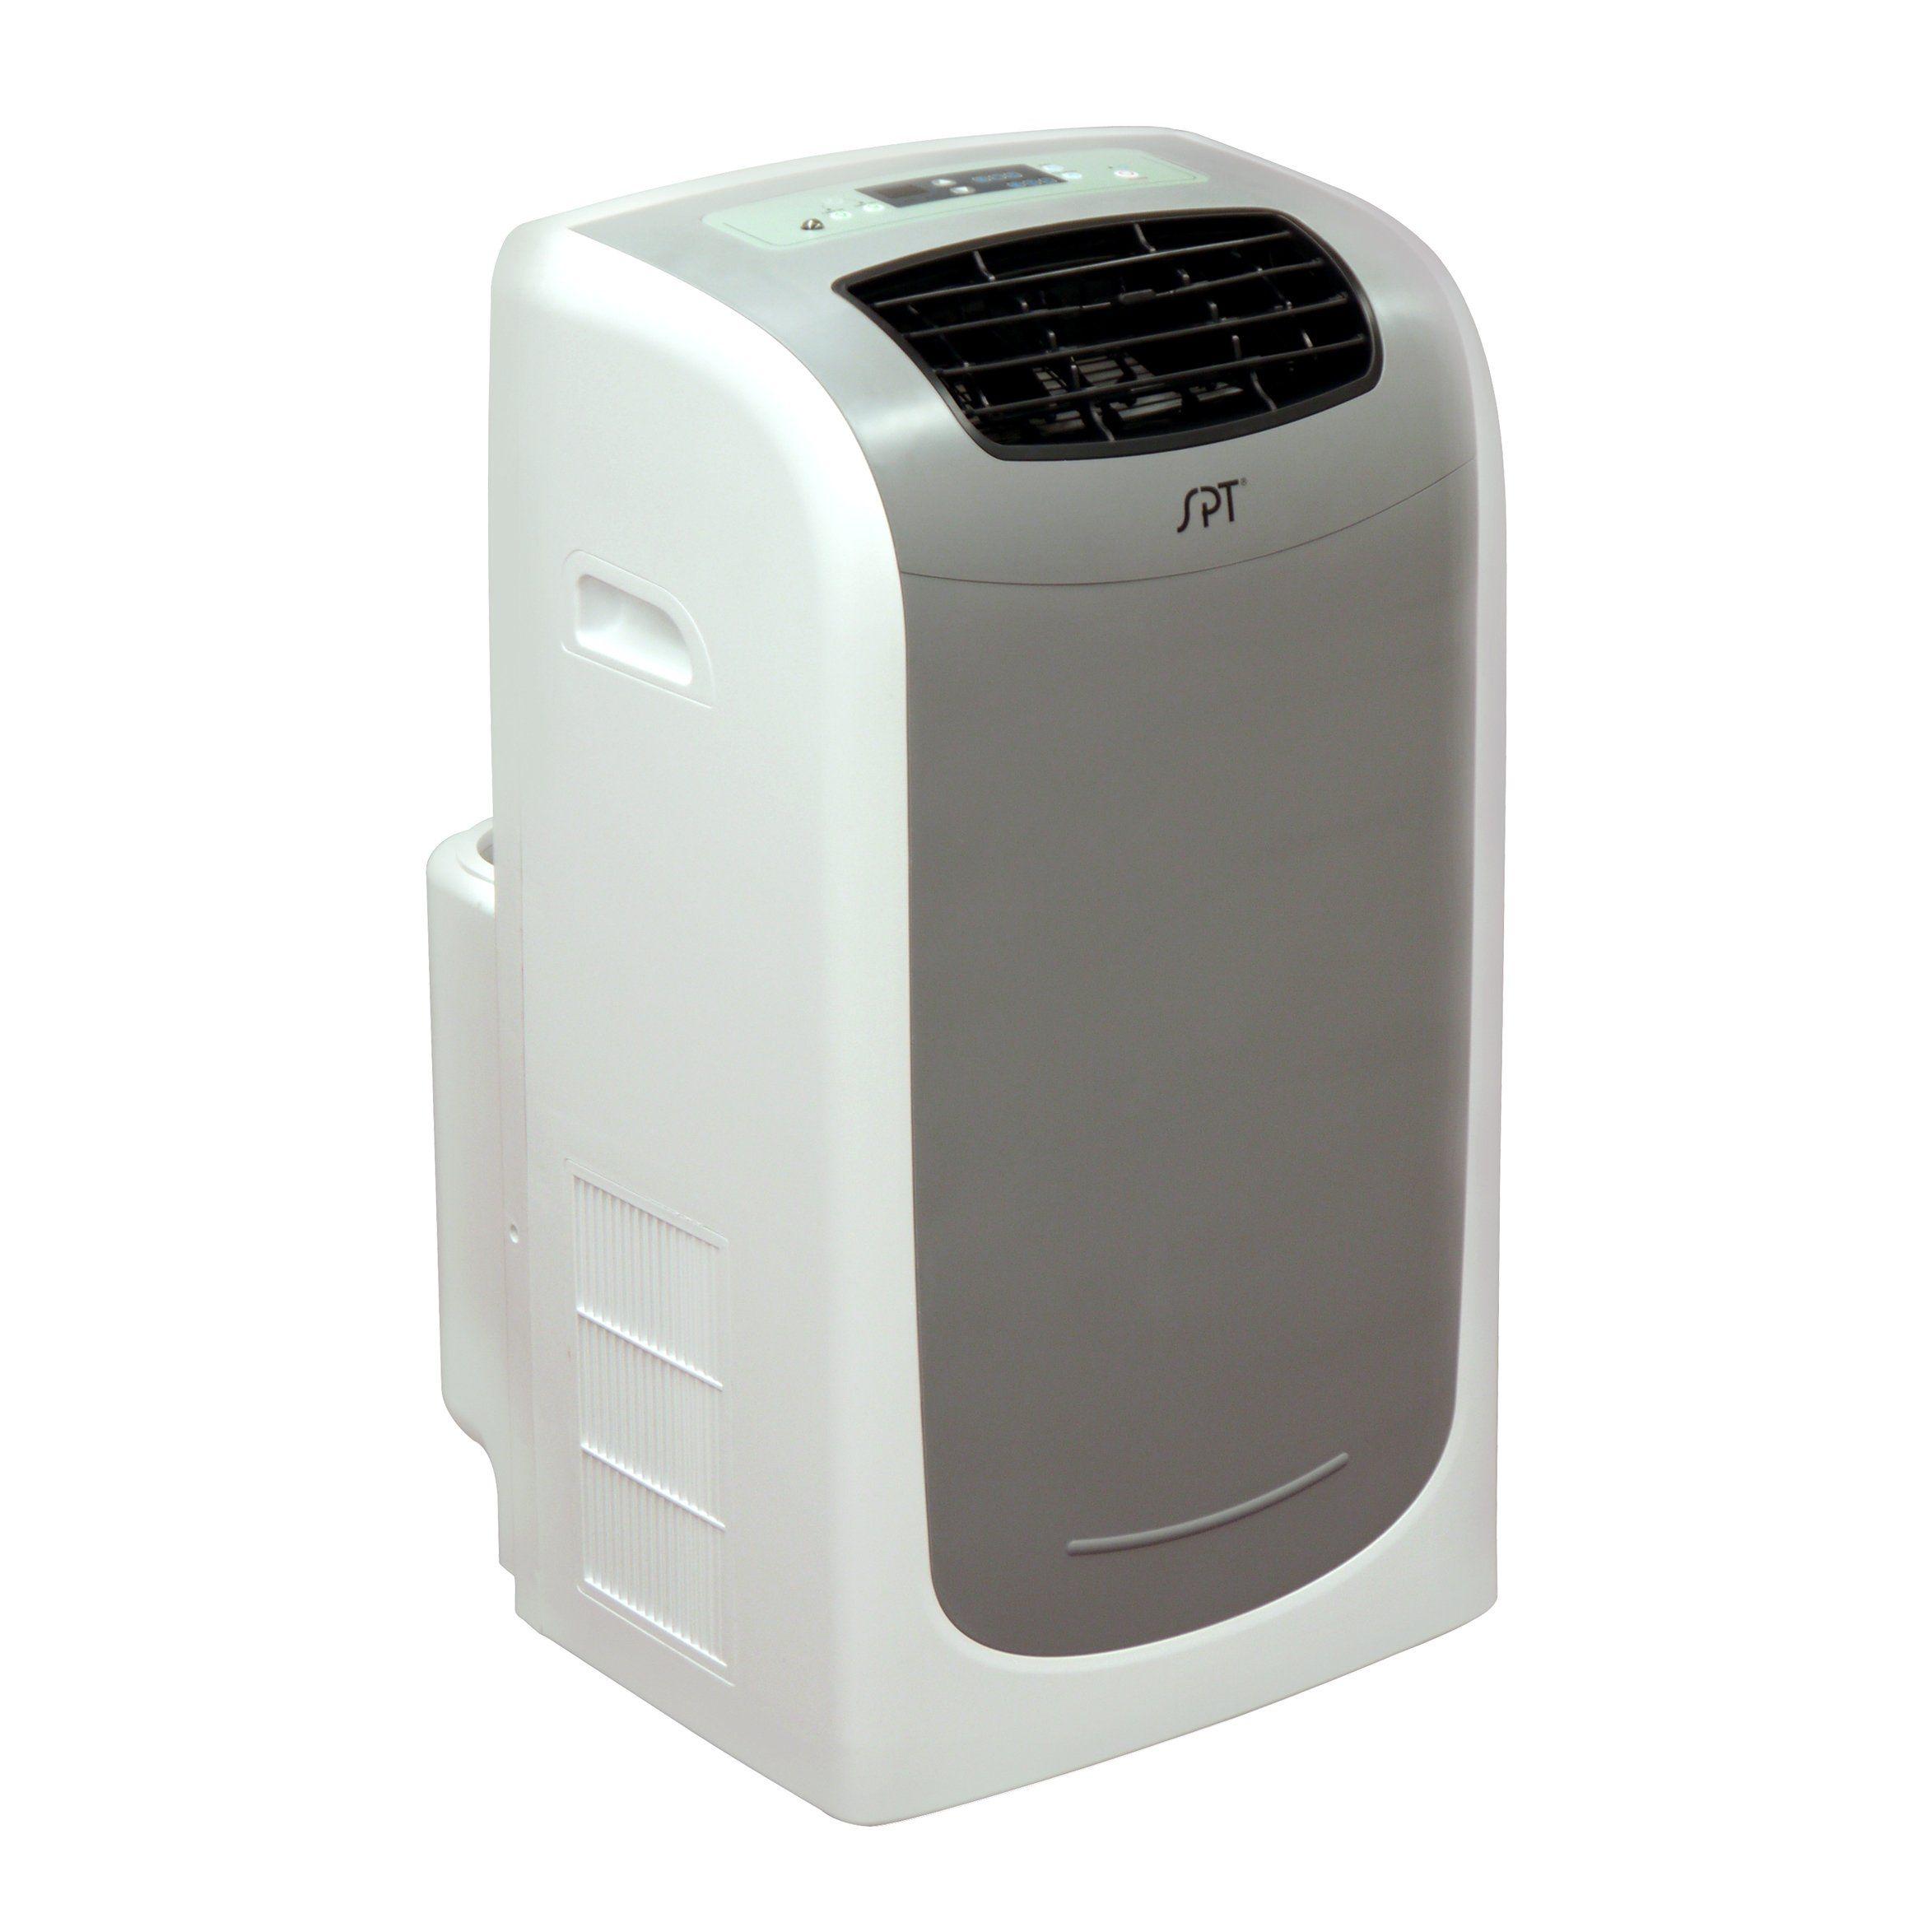 Wa 9020e Portable Air Conditioner Portable Air Conditioner Air Conditioner Btu Windowless Air Conditioner